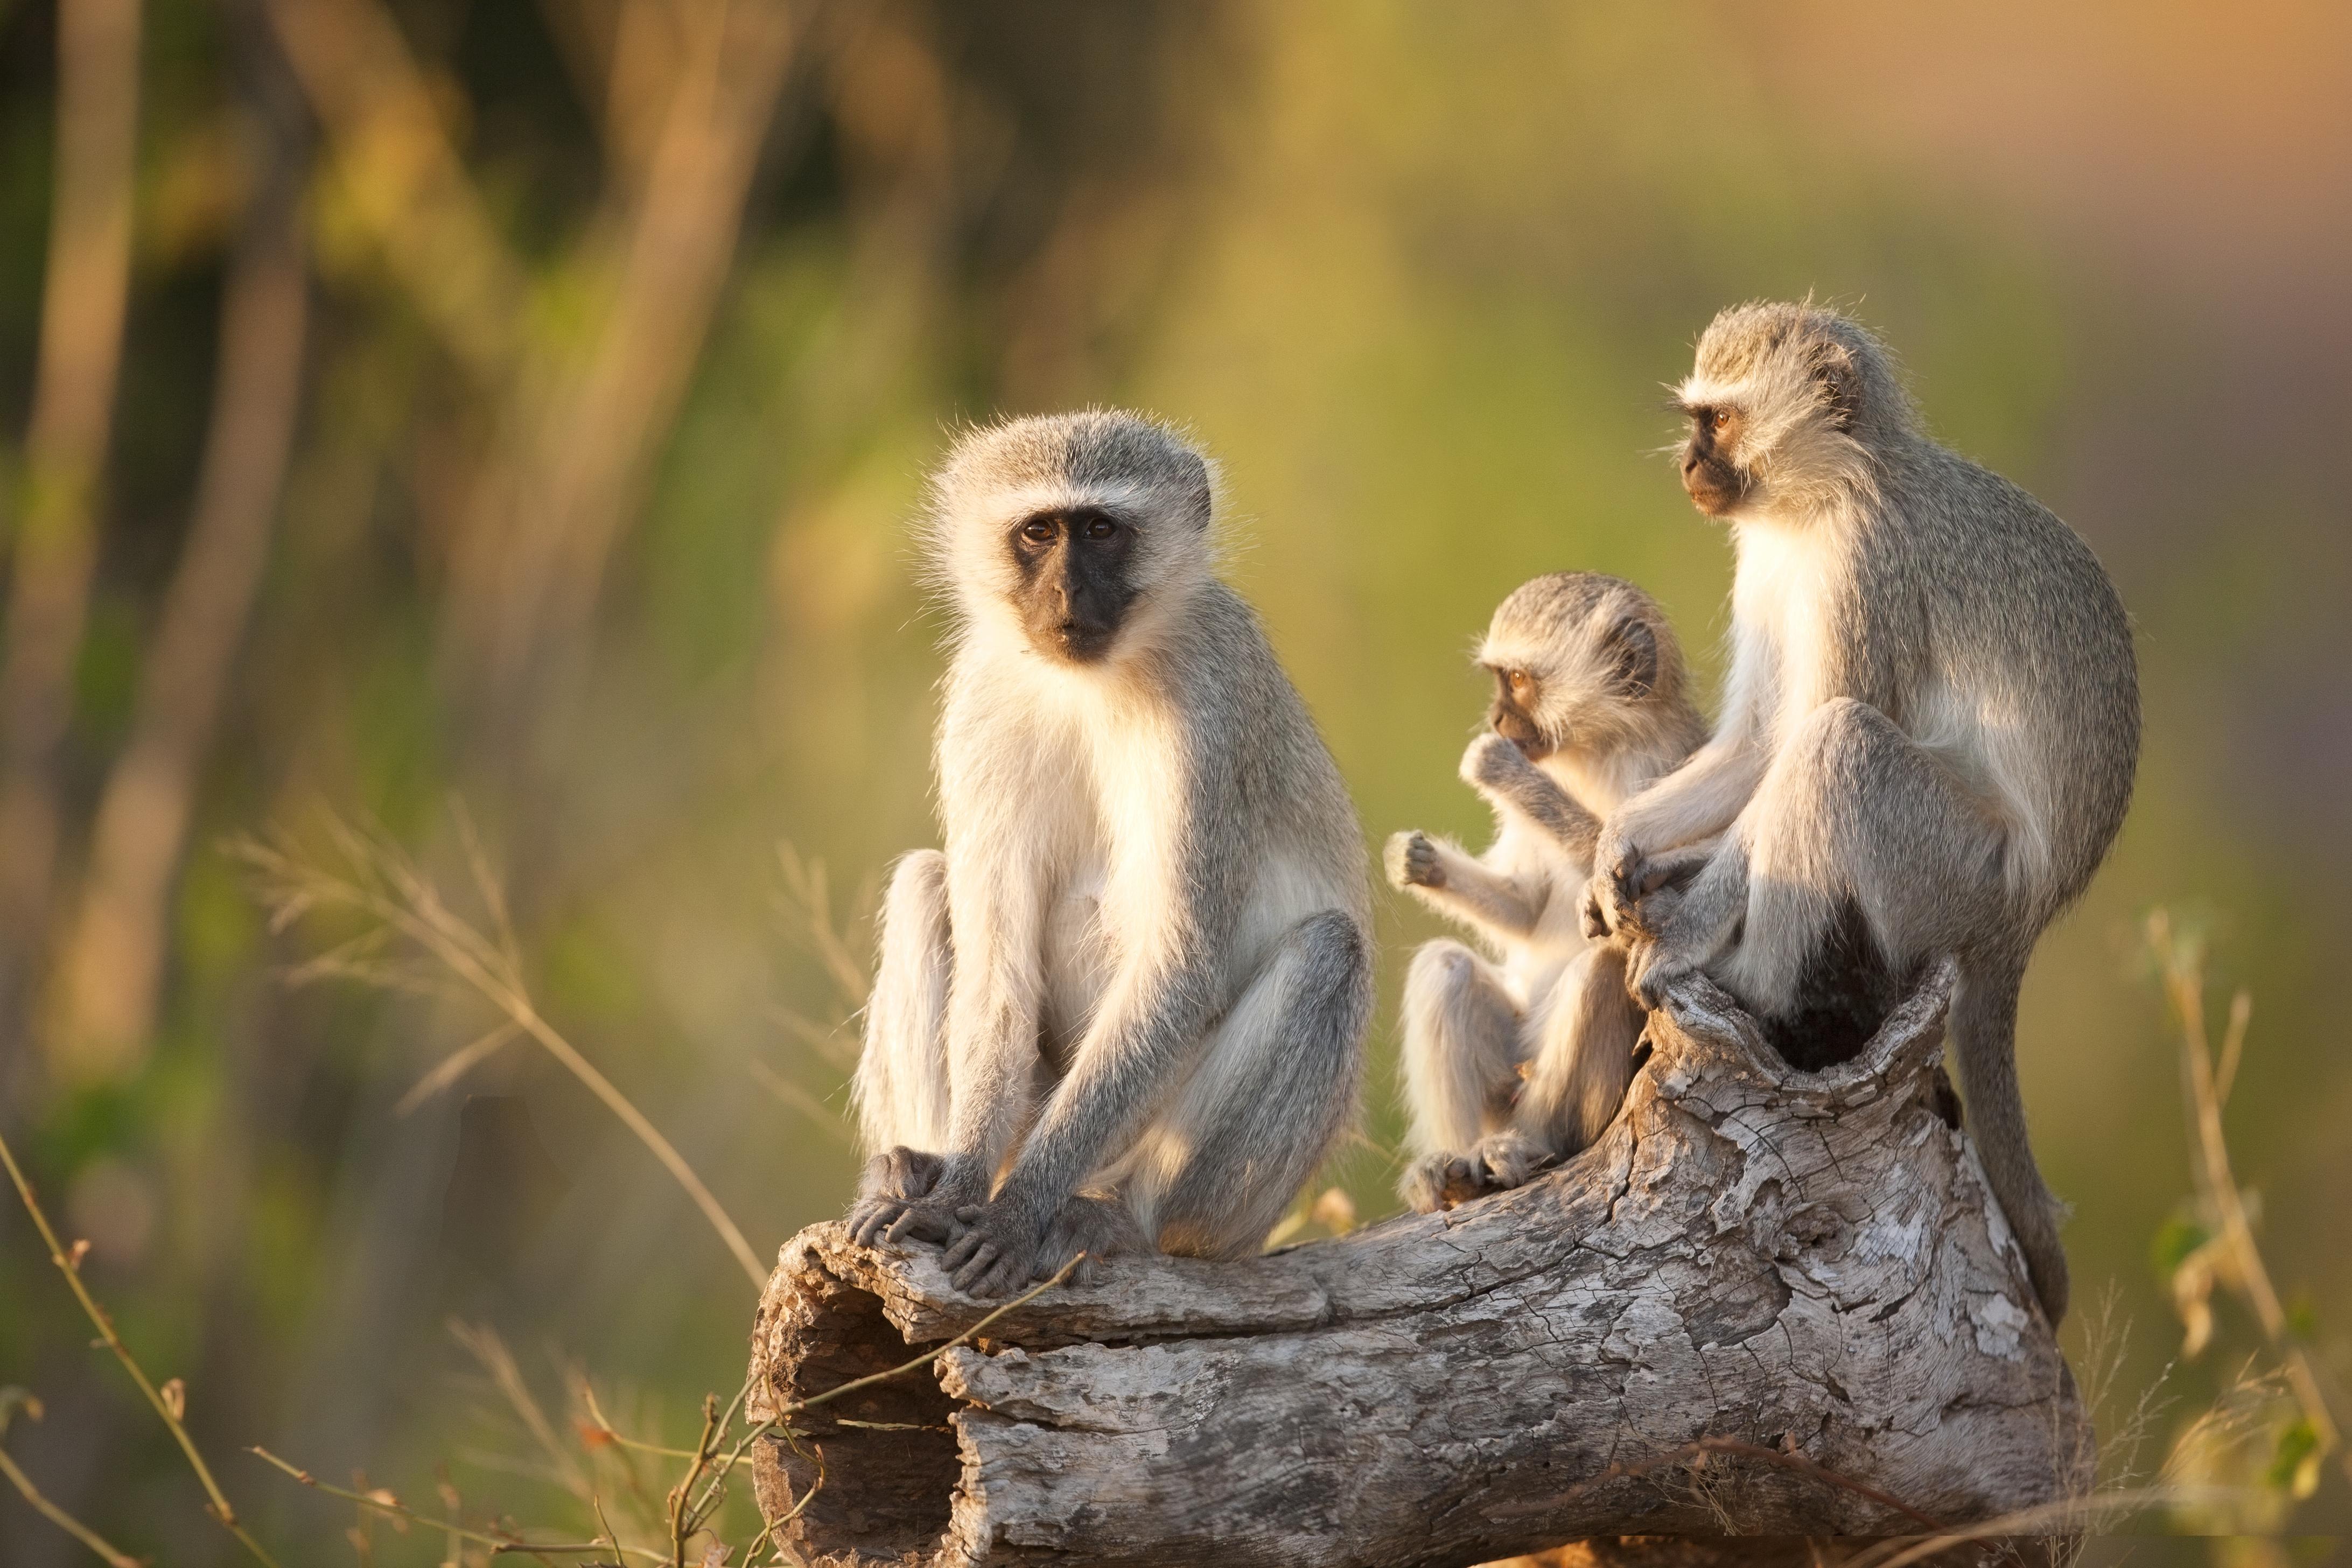 África mística y legendaria - Kenia Safari Safari Kenia y Tanzania: Ngorongoro